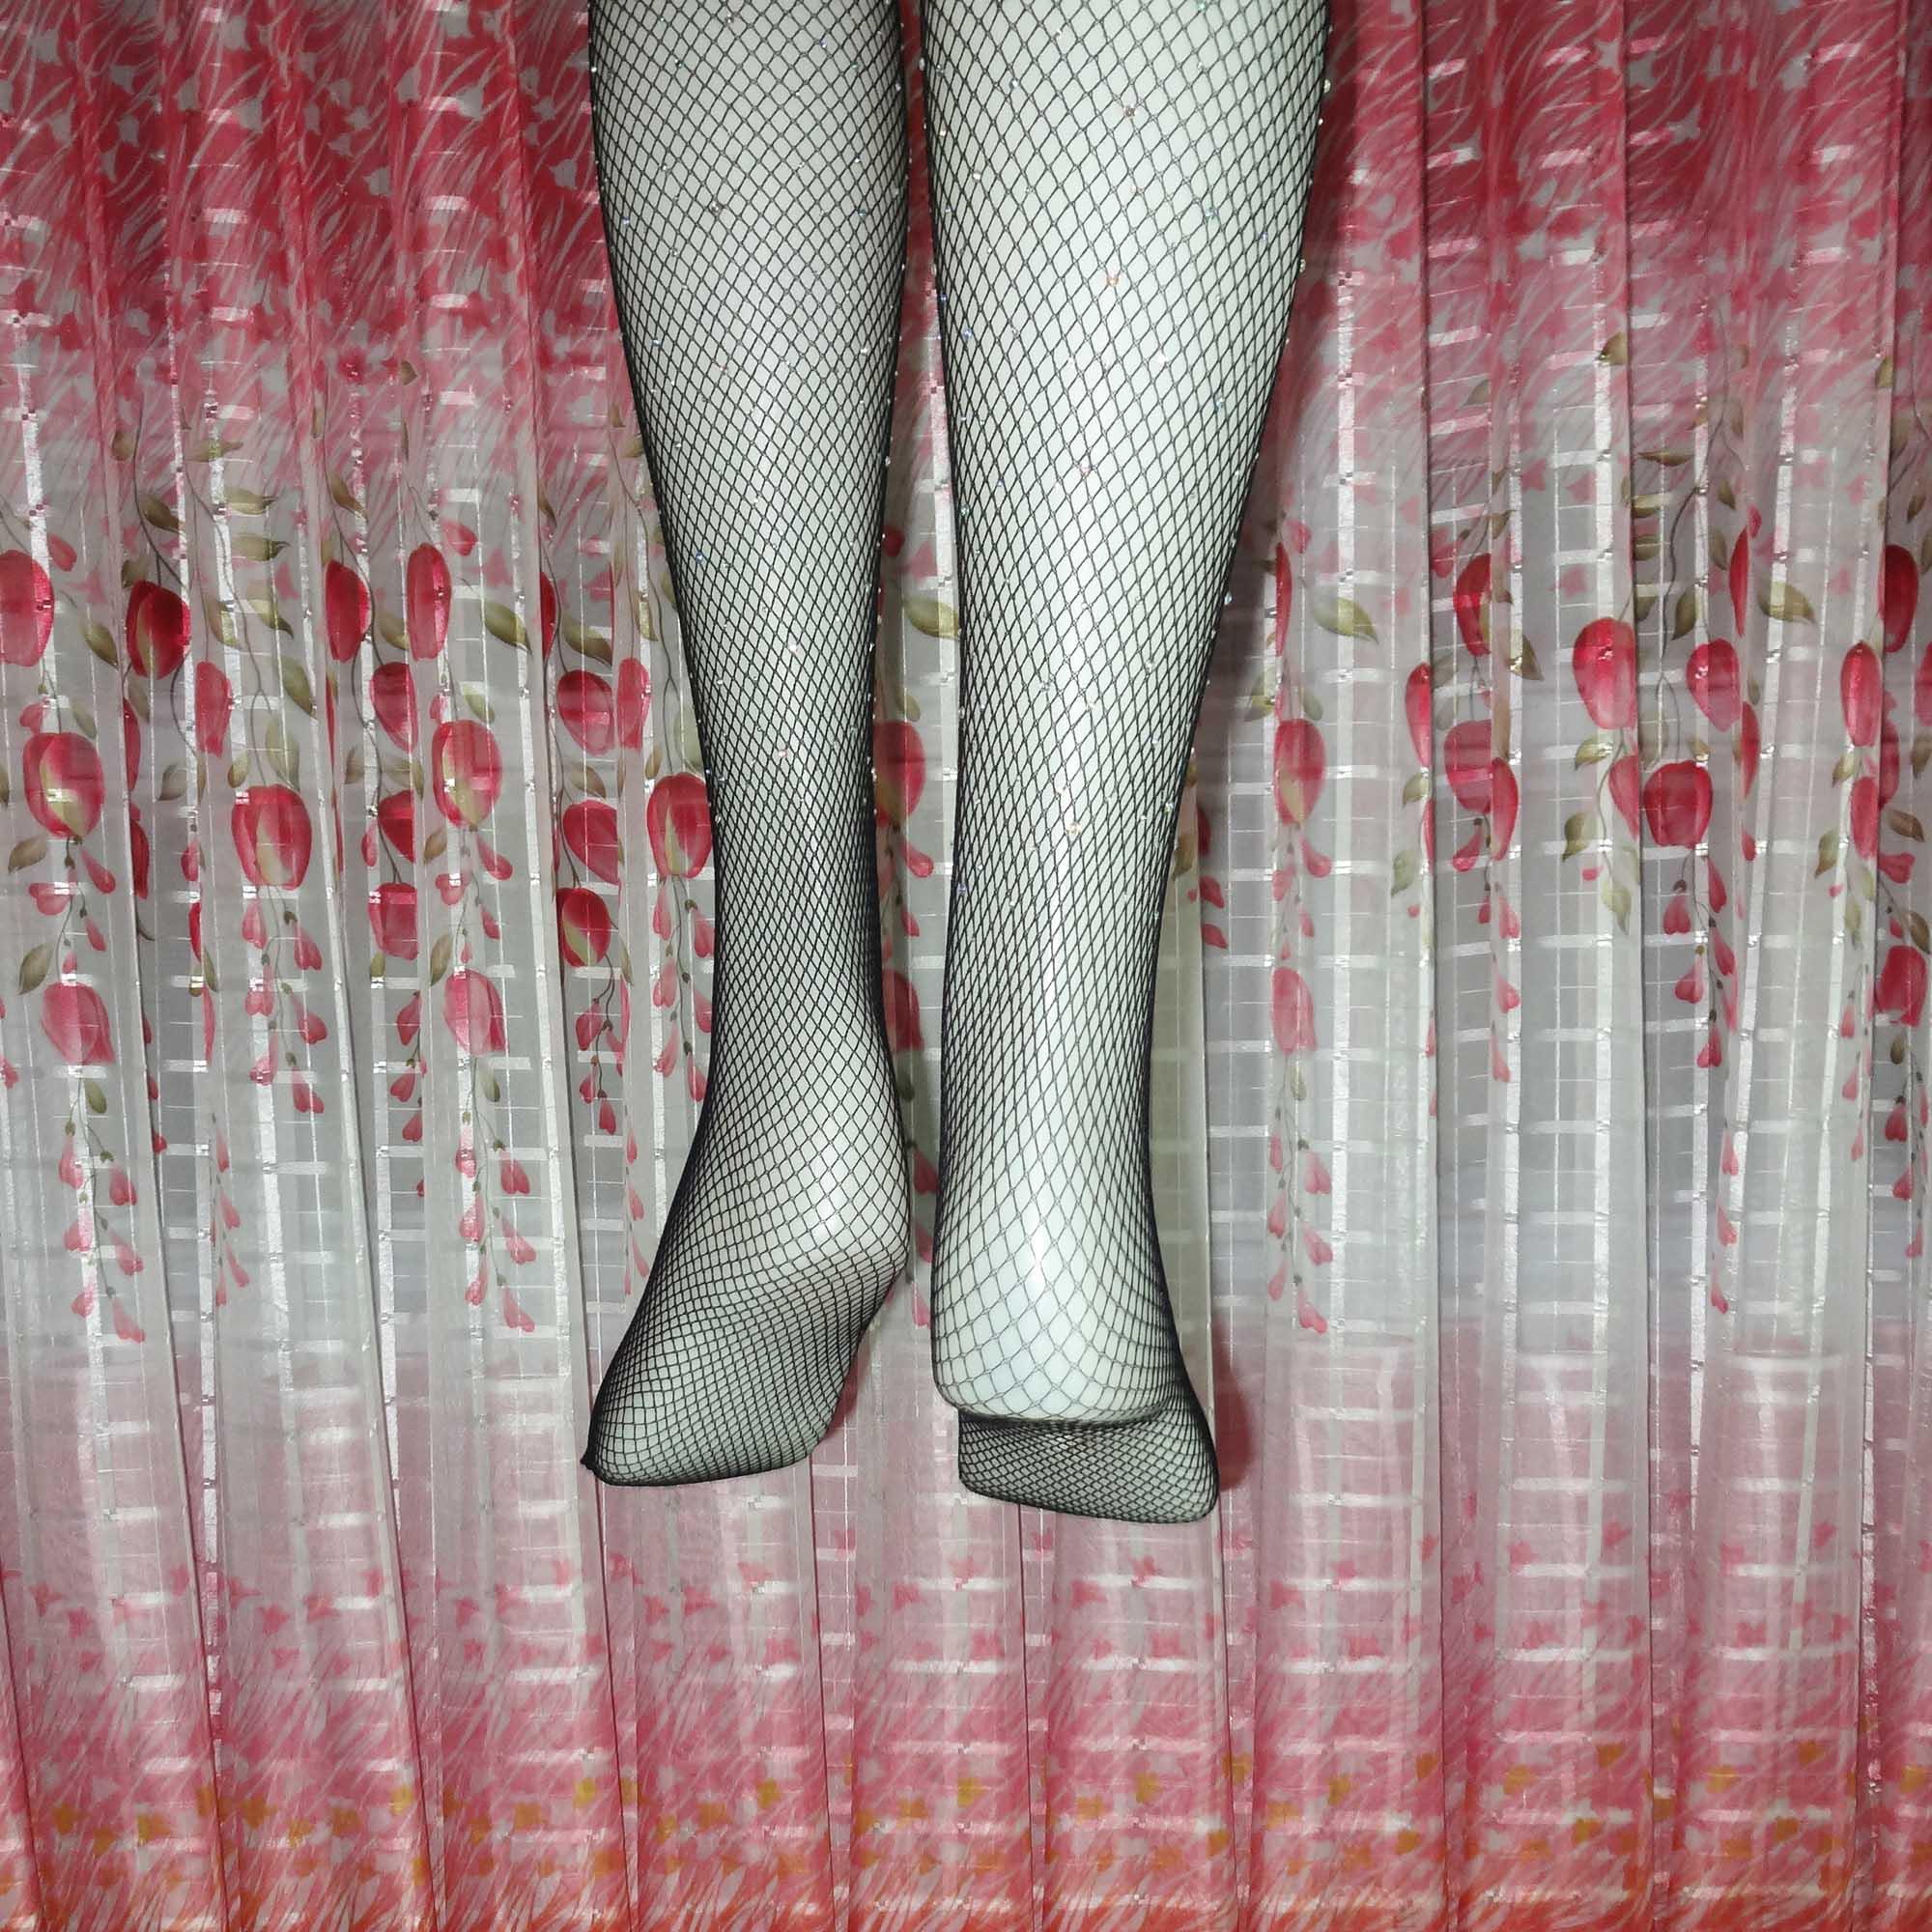 جوراب شلواری زنانه کد blaneg